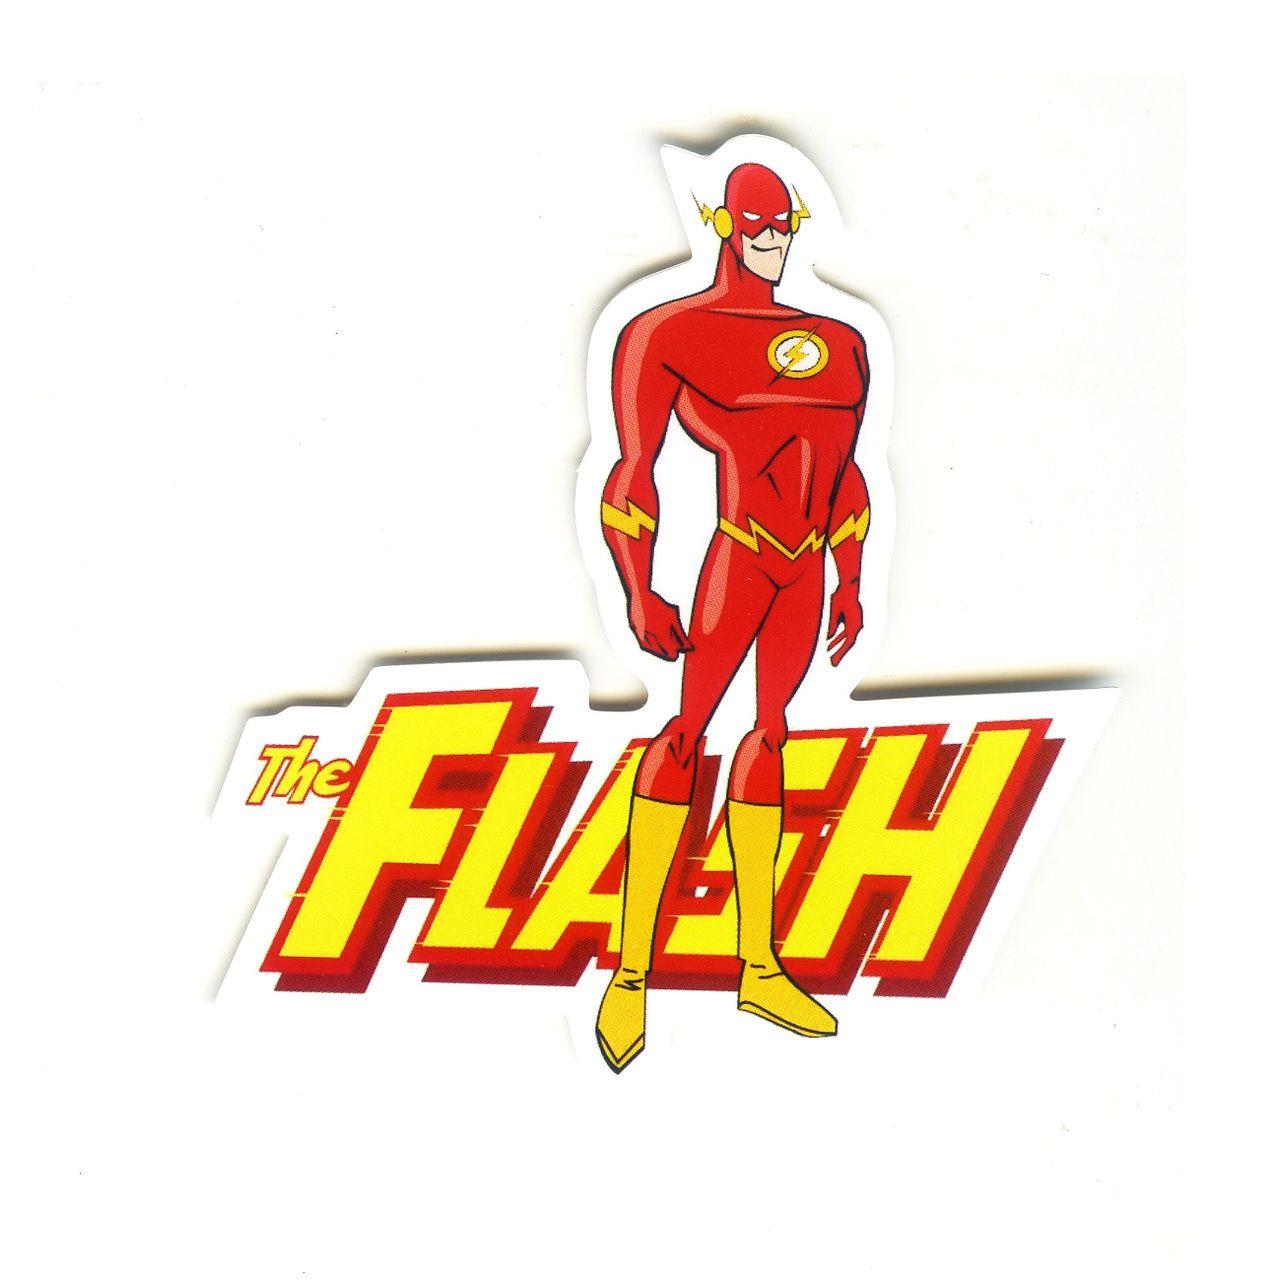 1495 The Flash Barry Allen Height 8 Cm Decal Sticker Decalstar Com [ 1280 x 1280 Pixel ]